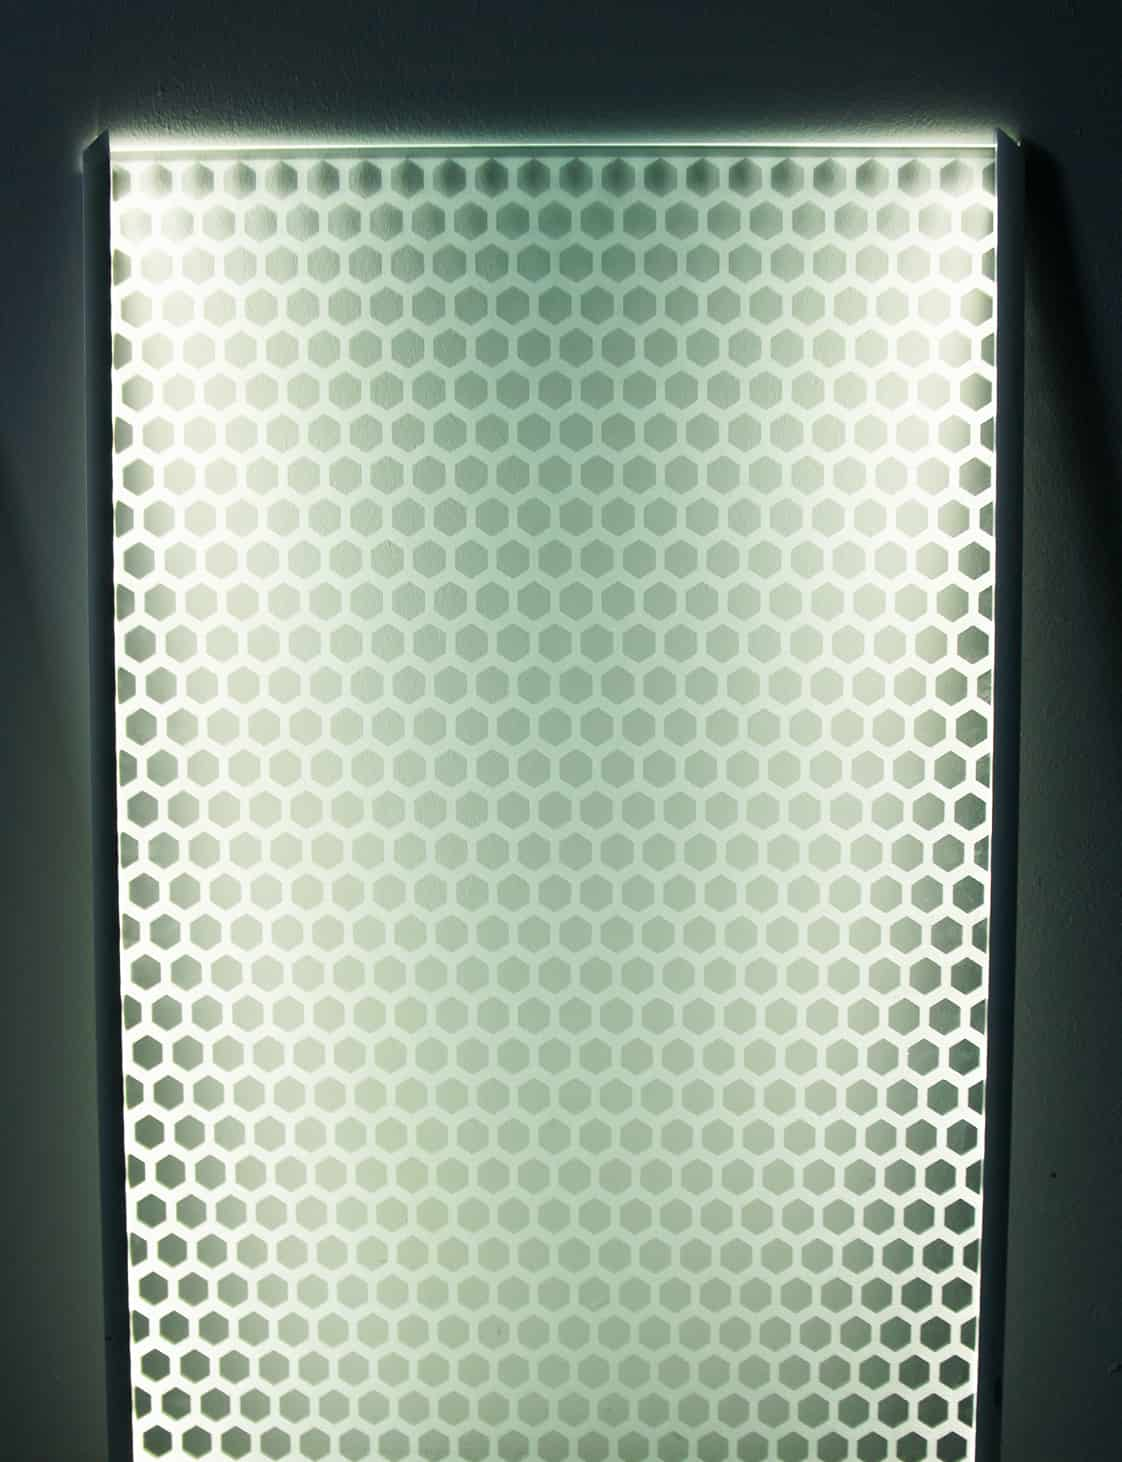 Luminescent glasses / Pattern 4